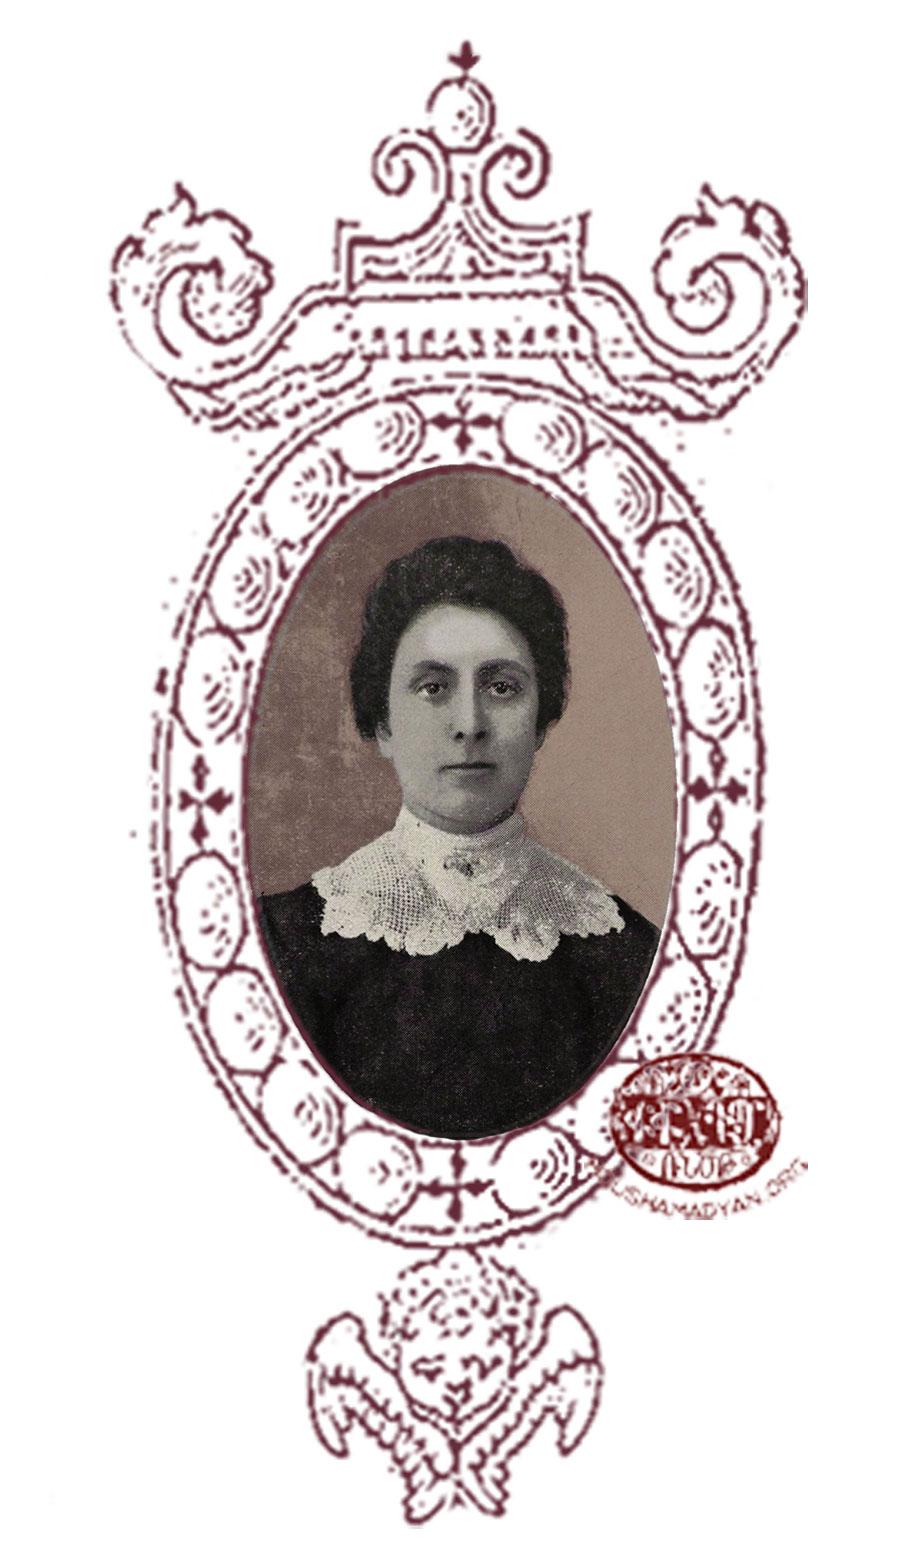 Elizabeth Harley